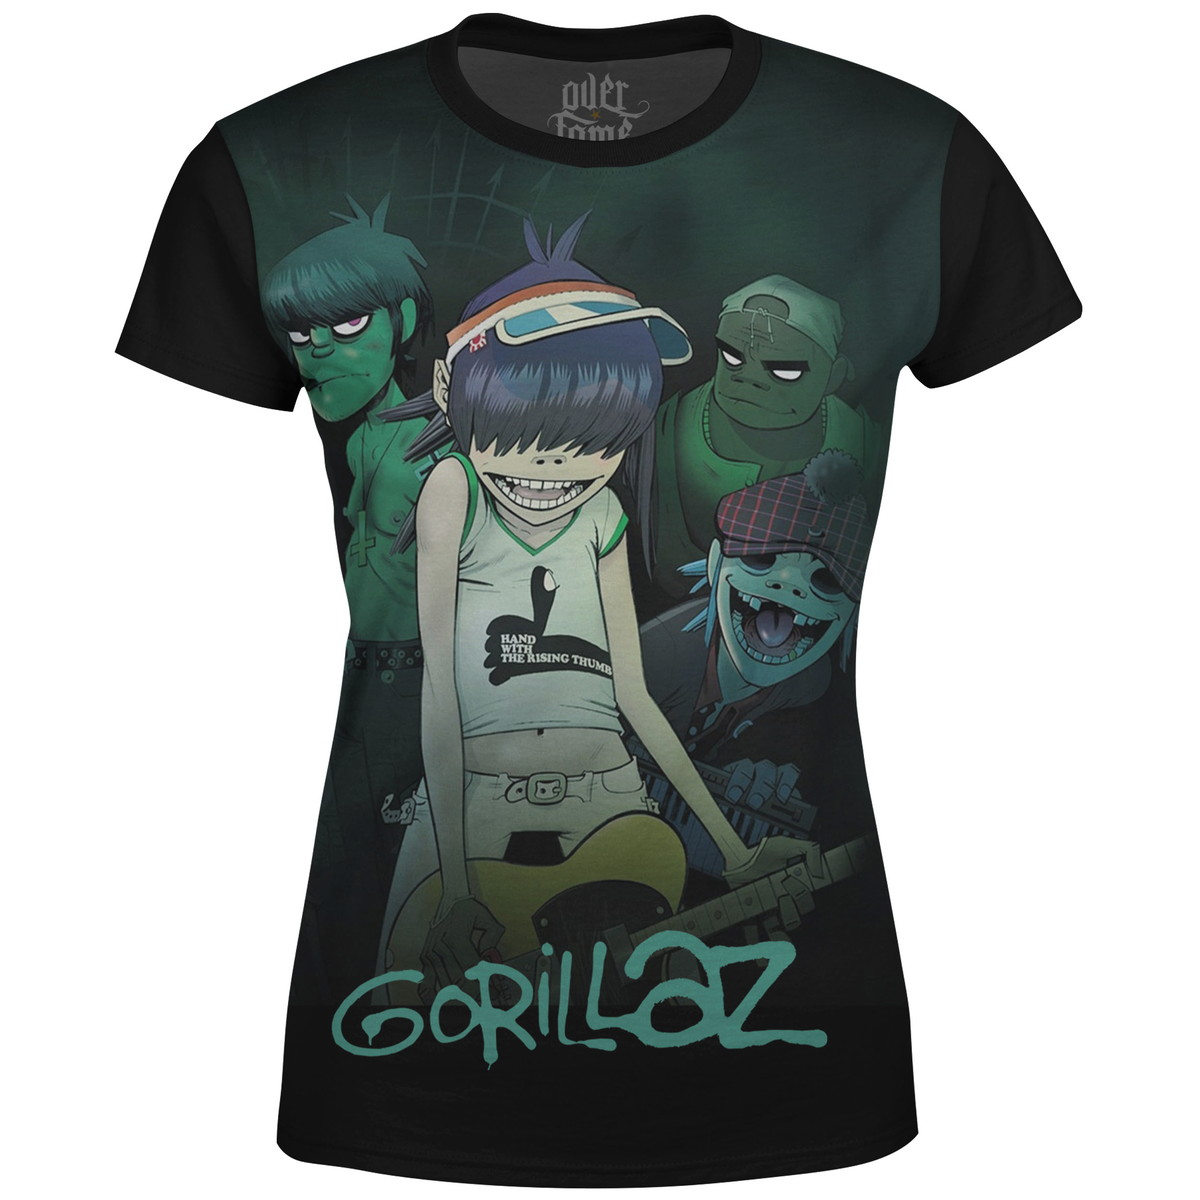 Camiseta Baby Look Feminina Gorillaz Estampa digital md01 no Elo7 ... 2ab32060f431b